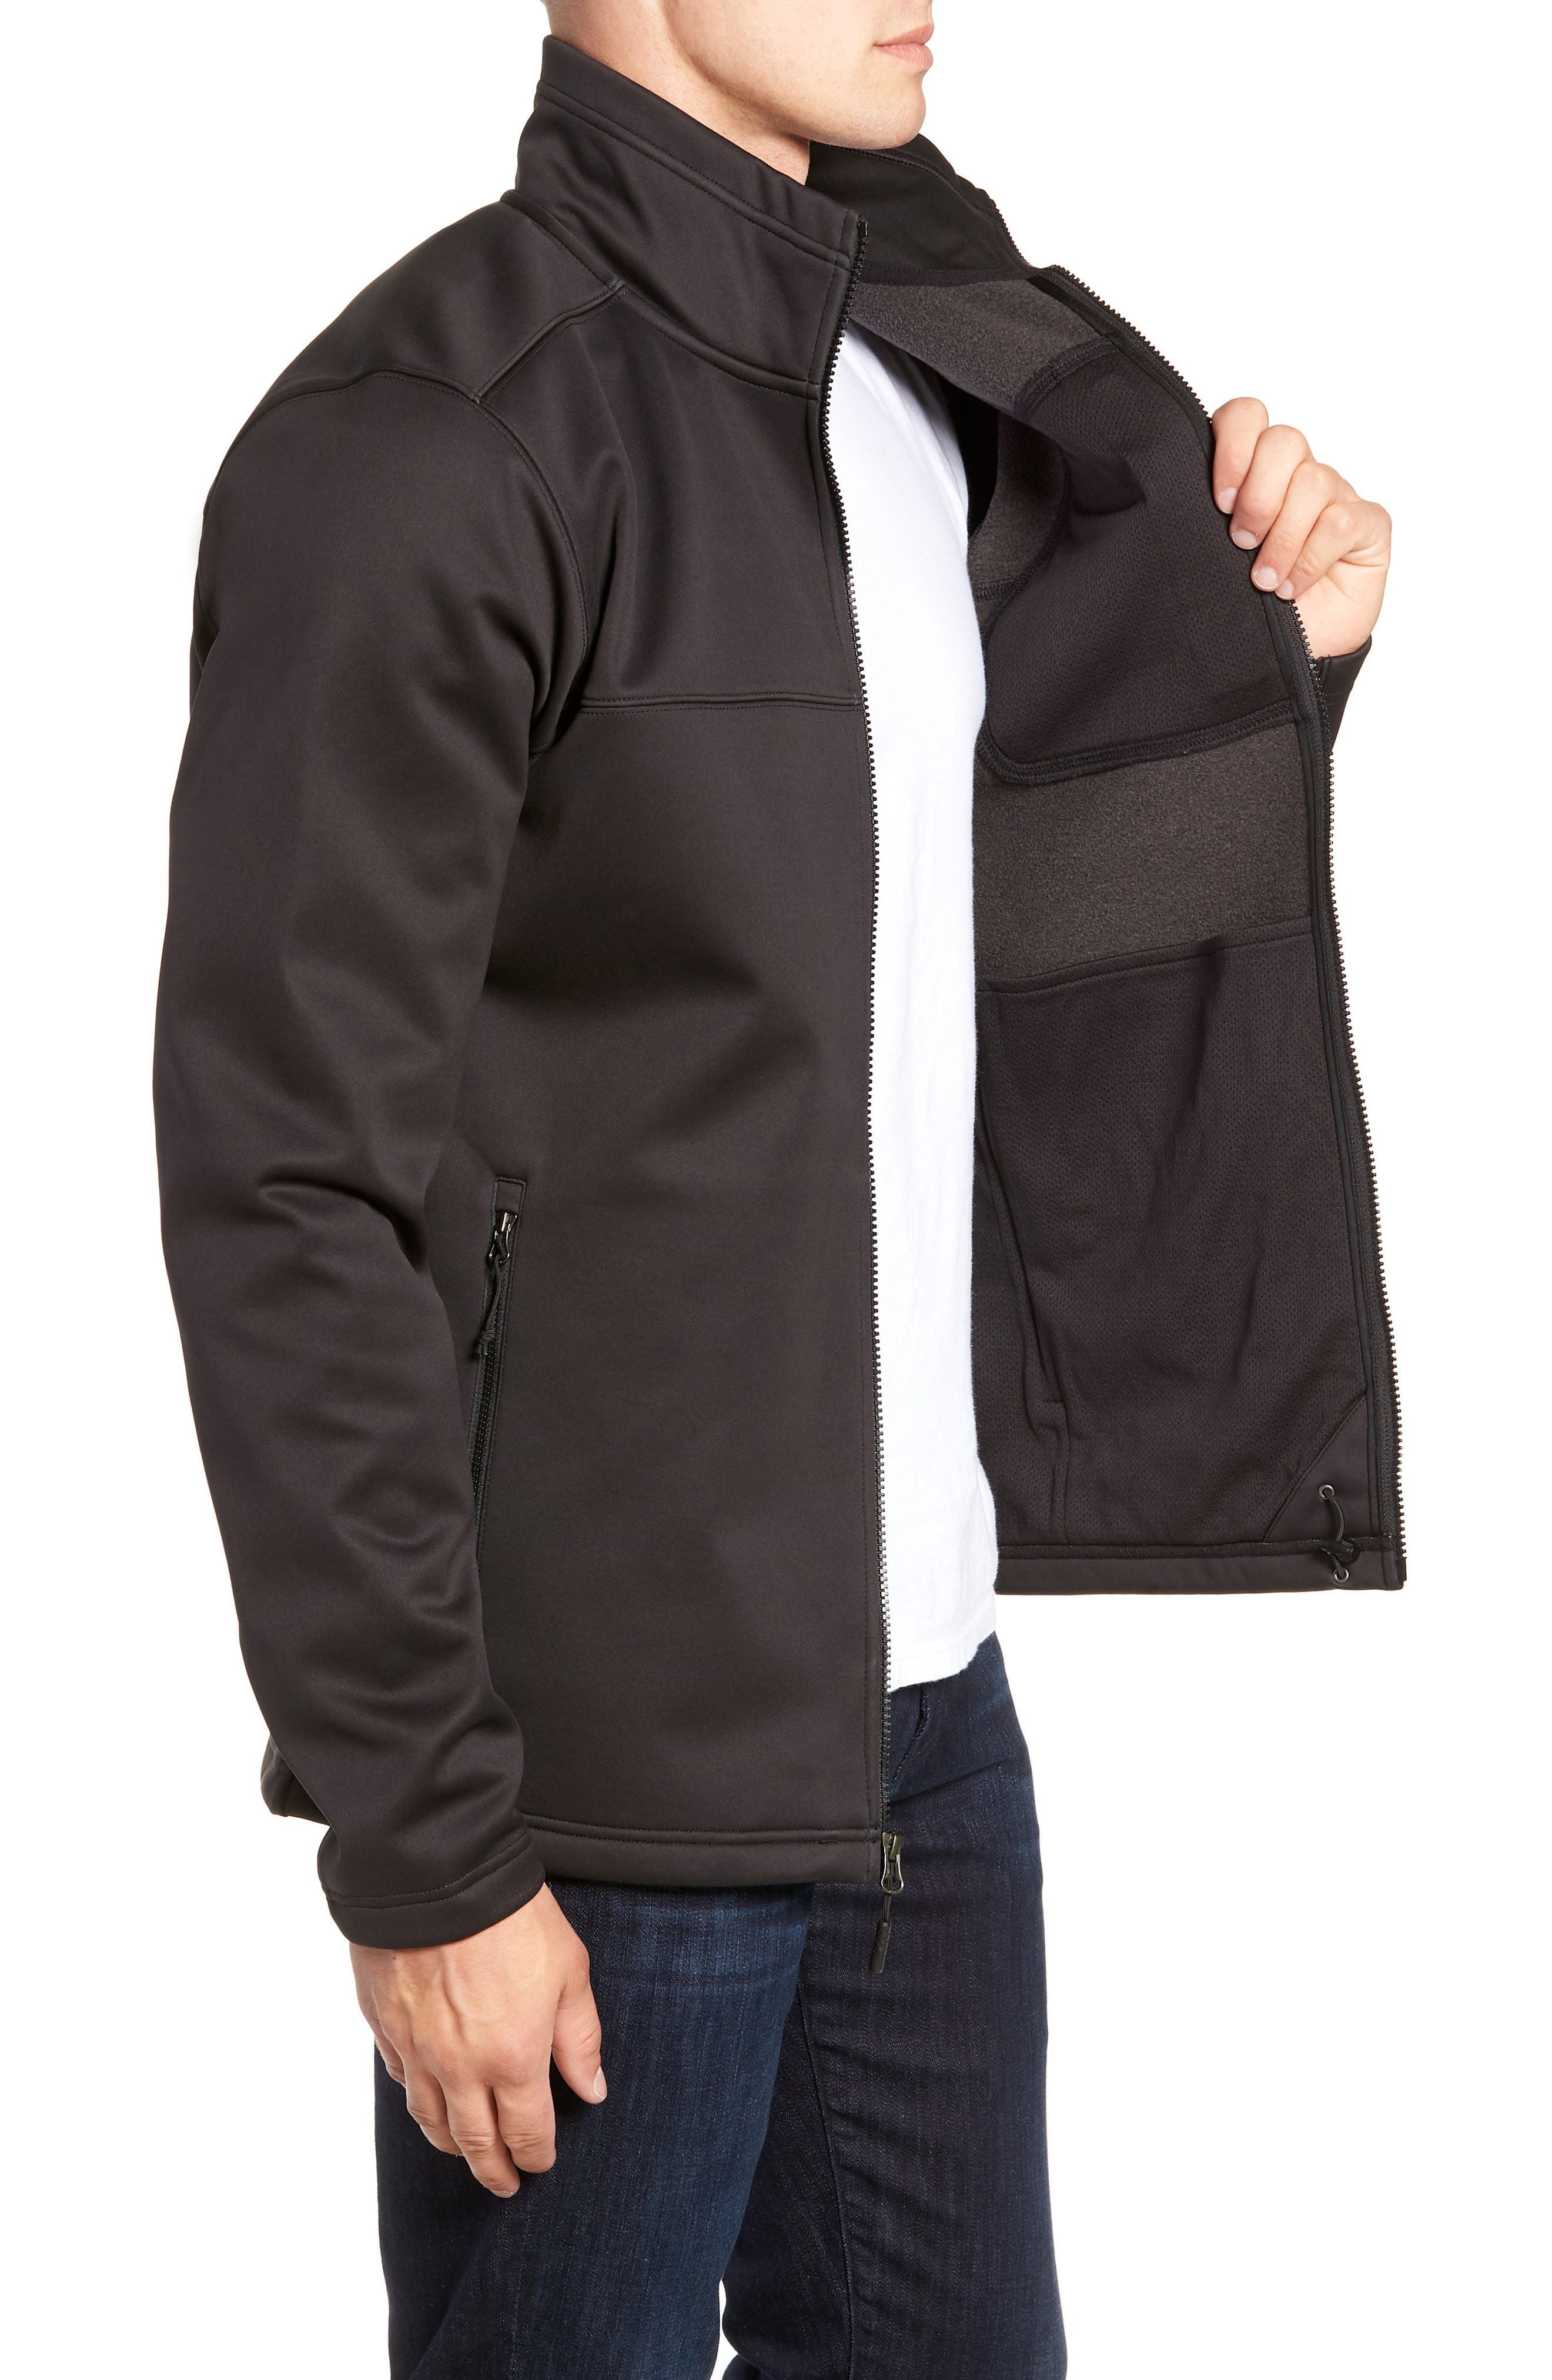 Apex Risor Jacket,                             Alternate thumbnail 3, color,                             TNF BLACK/ TNF BLACK